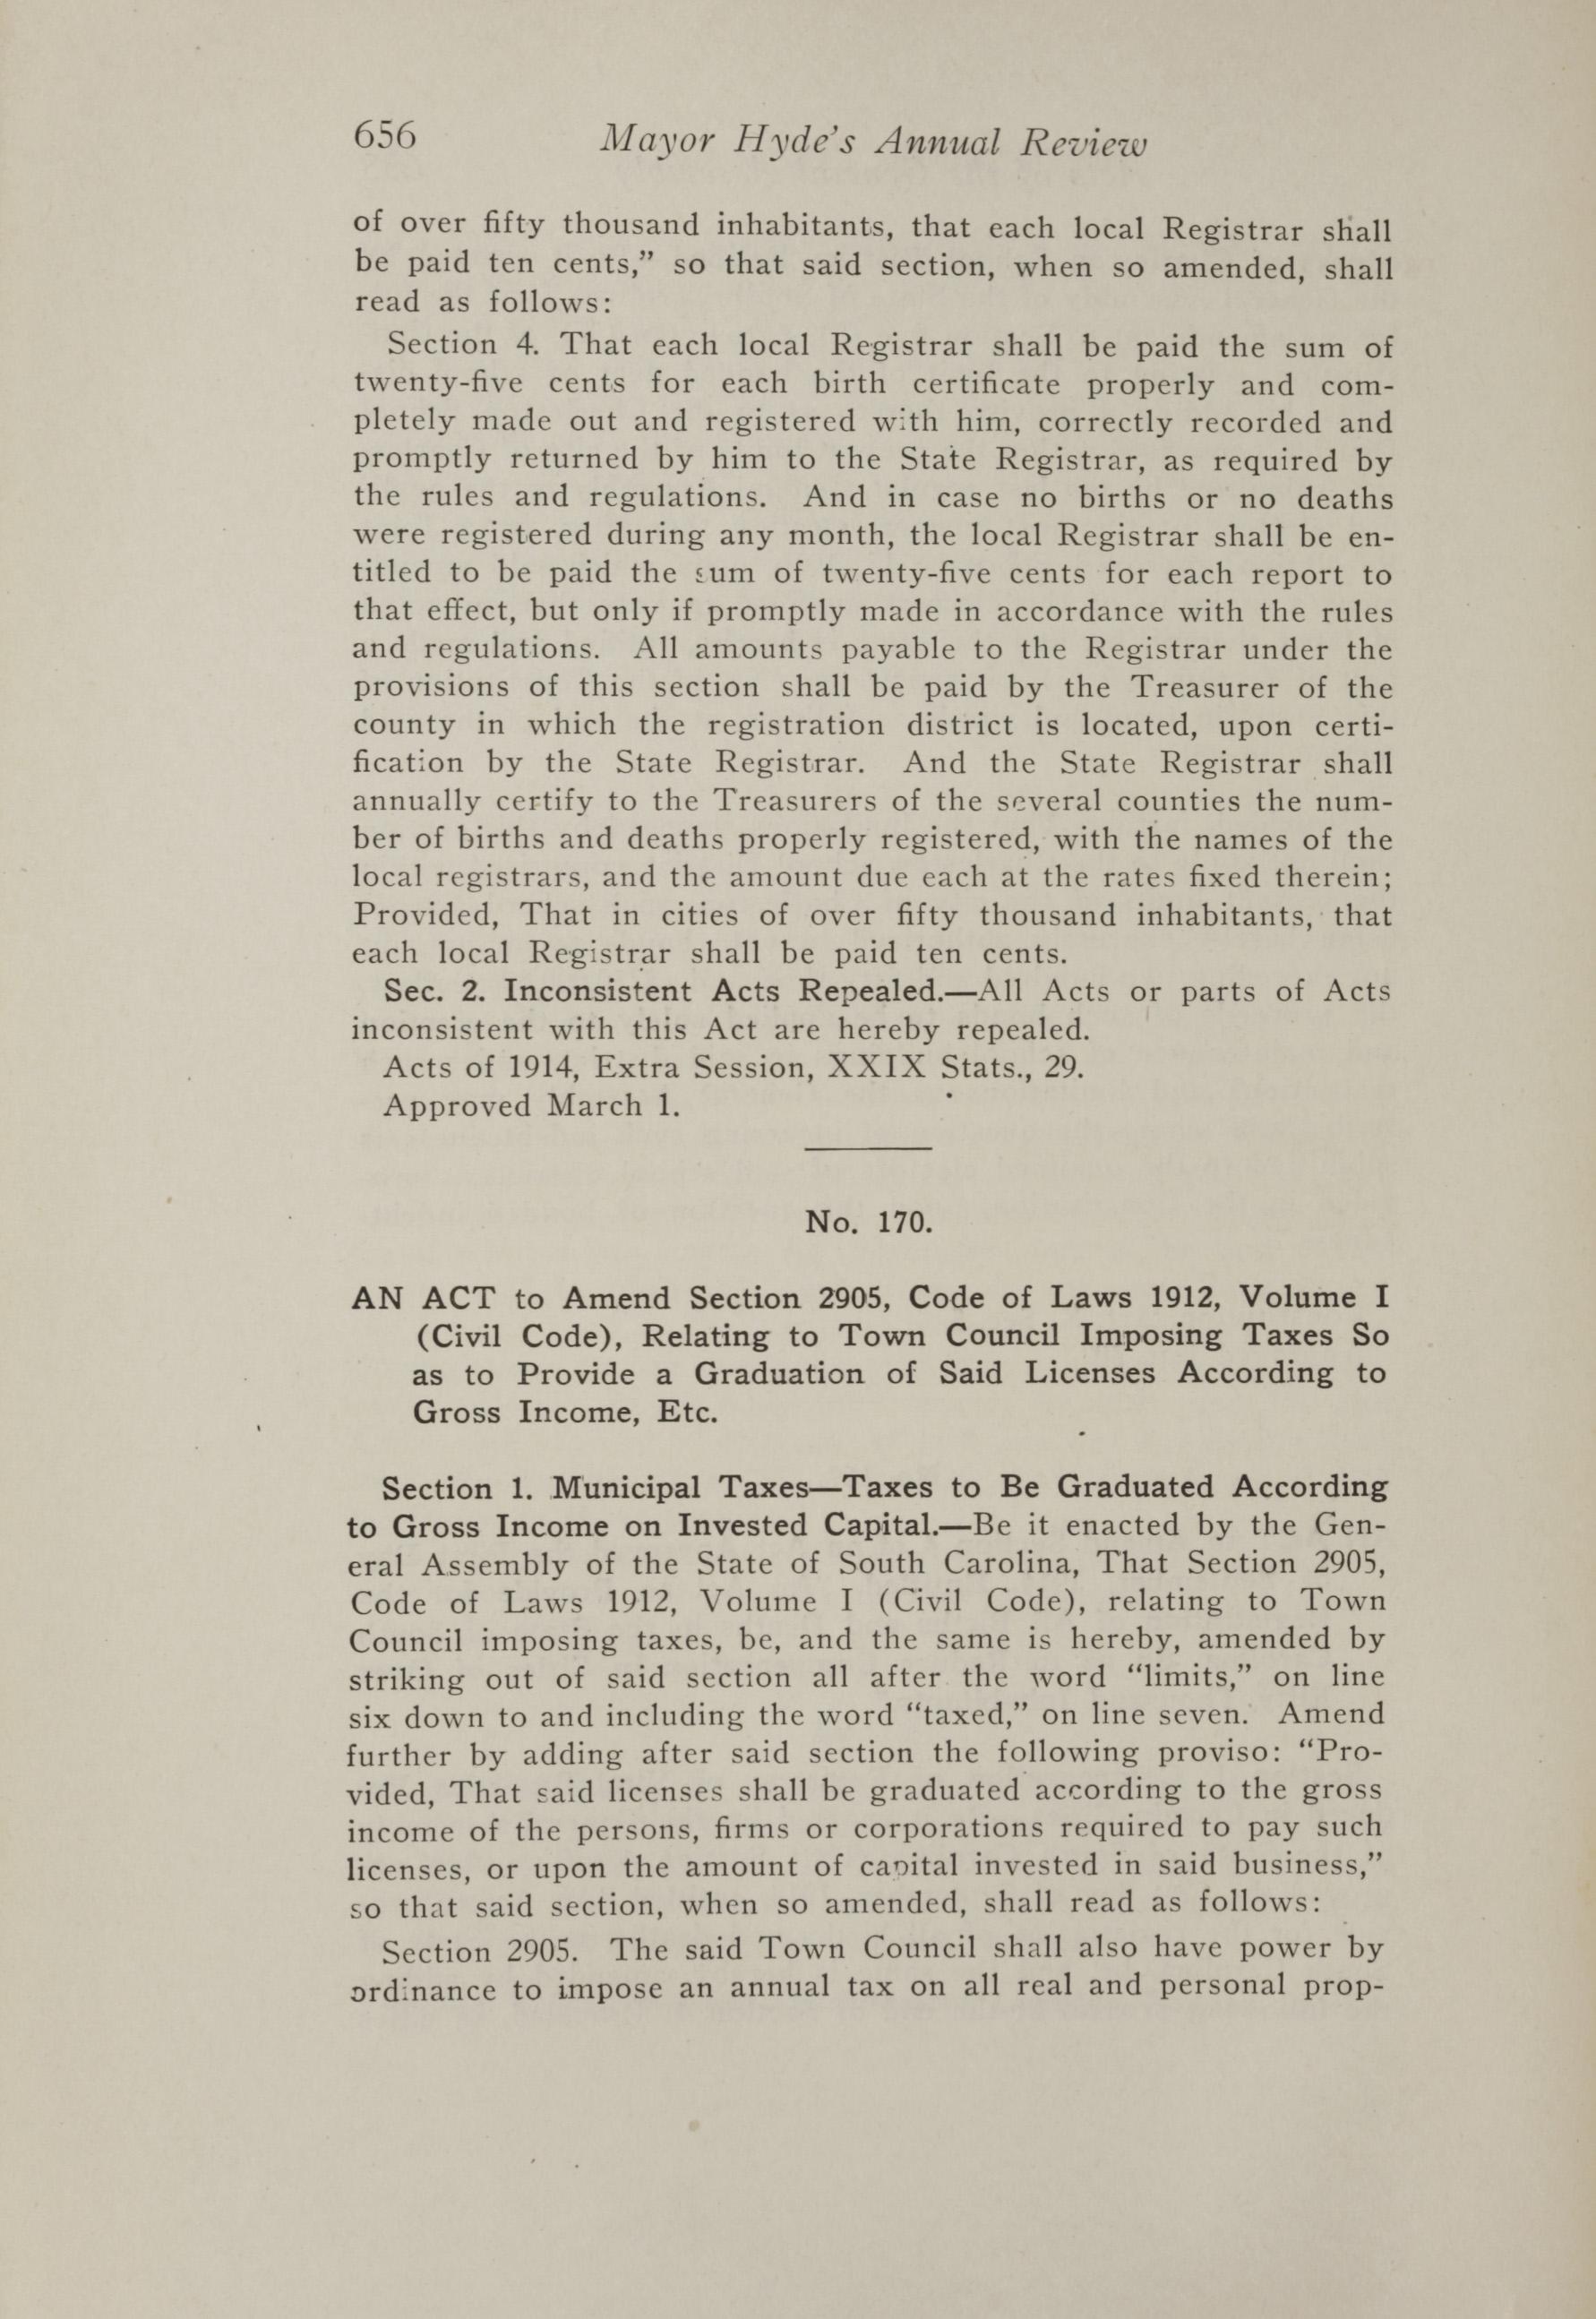 Charleston Yearbook, 1917, page 656